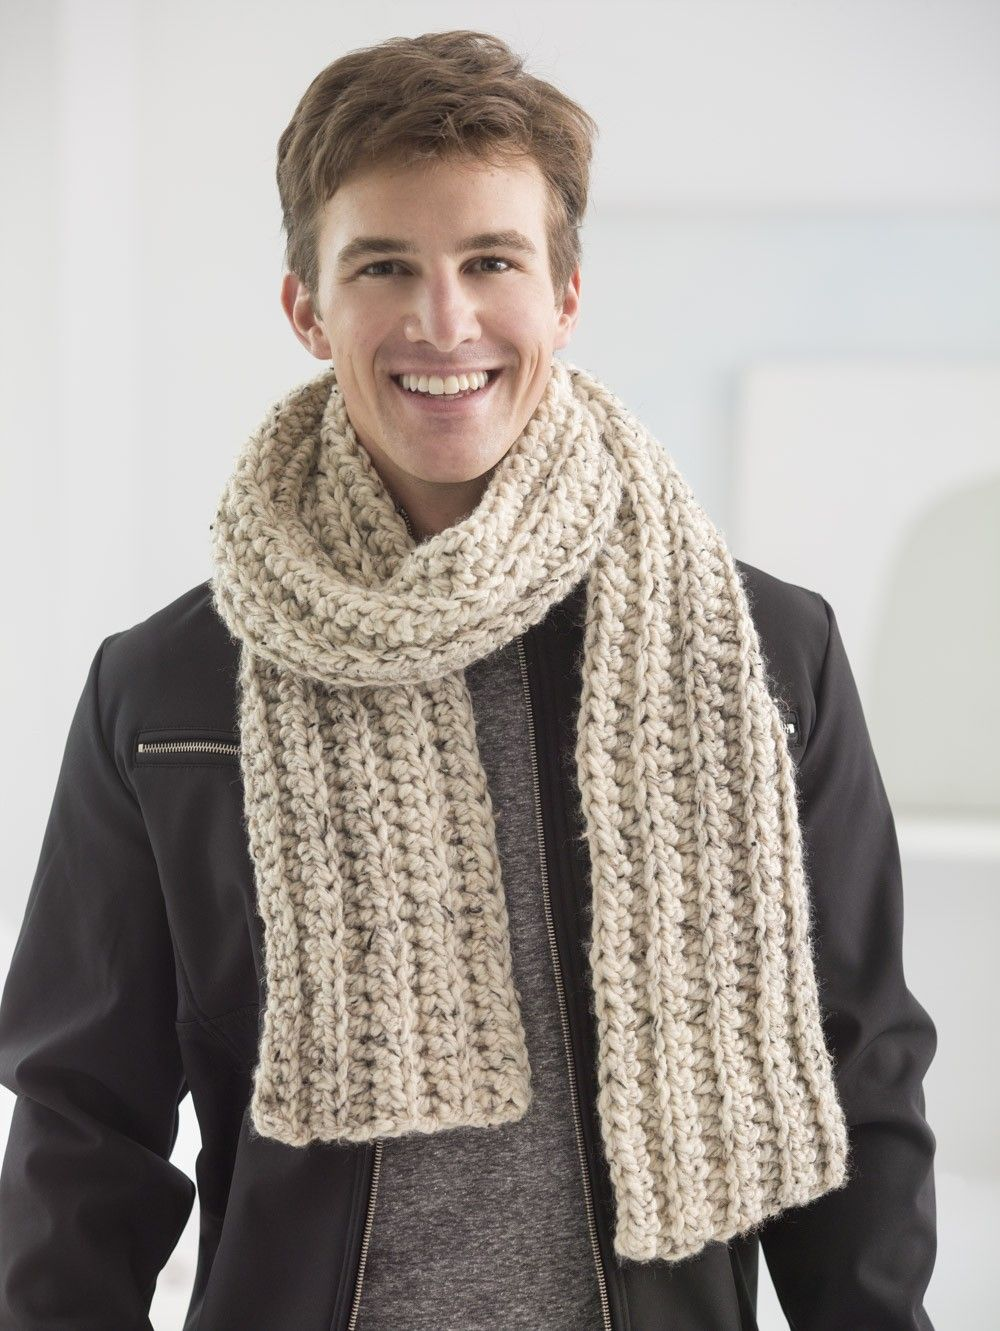 Brunch With Friends #Scarfie (Crochet) - Patterns - Lion Brand Yarn ...